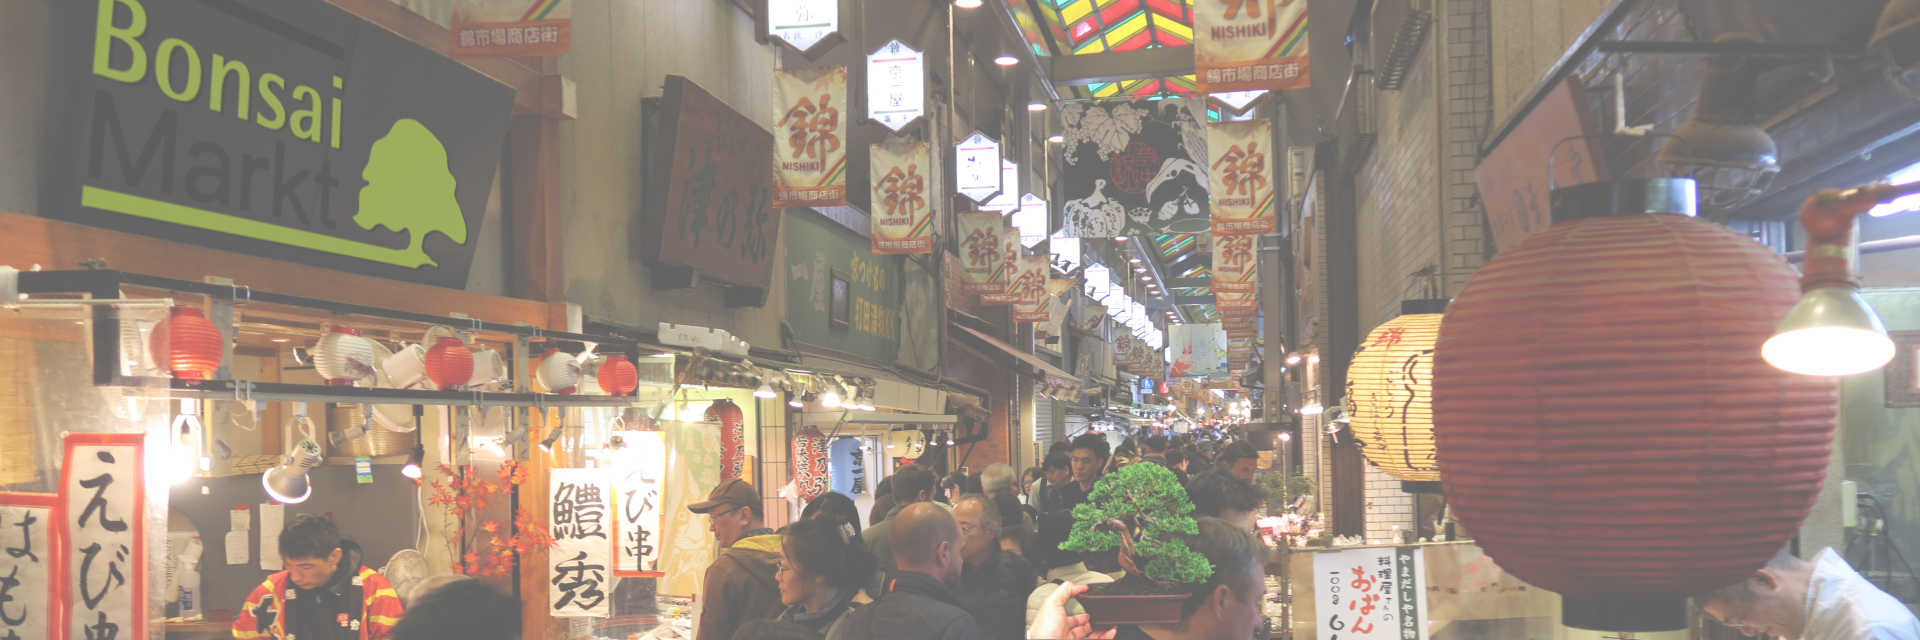 Bonsai Markt